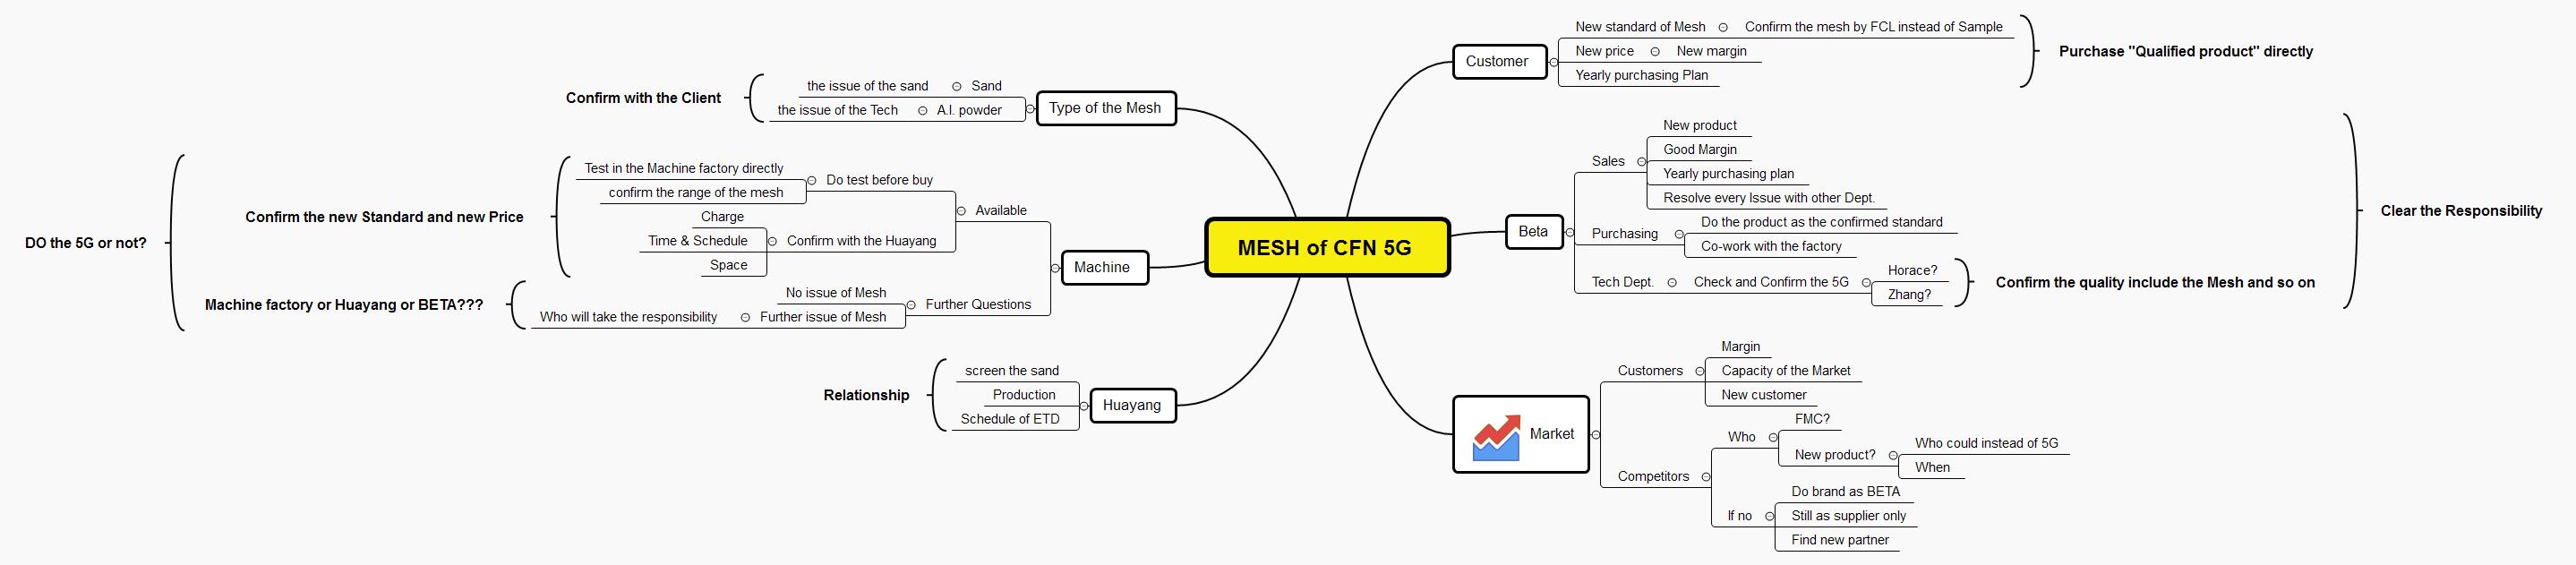 MESH of CFN 5G